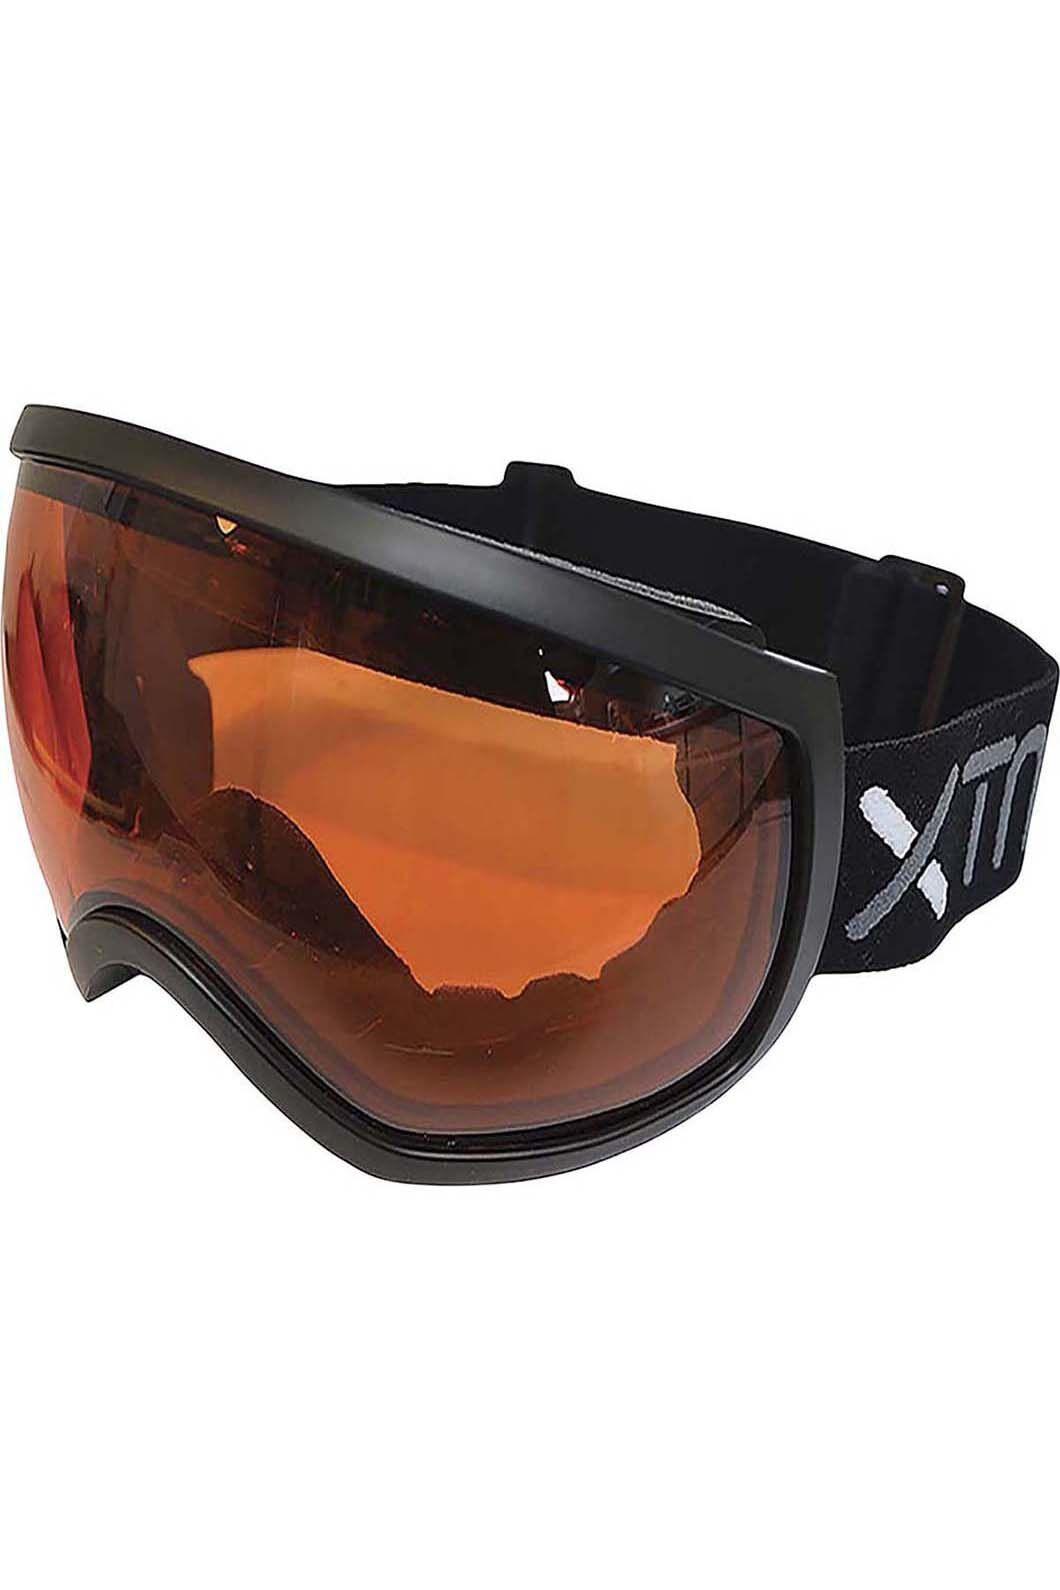 XTM Force Double Lens Goggles, Black, hi-res